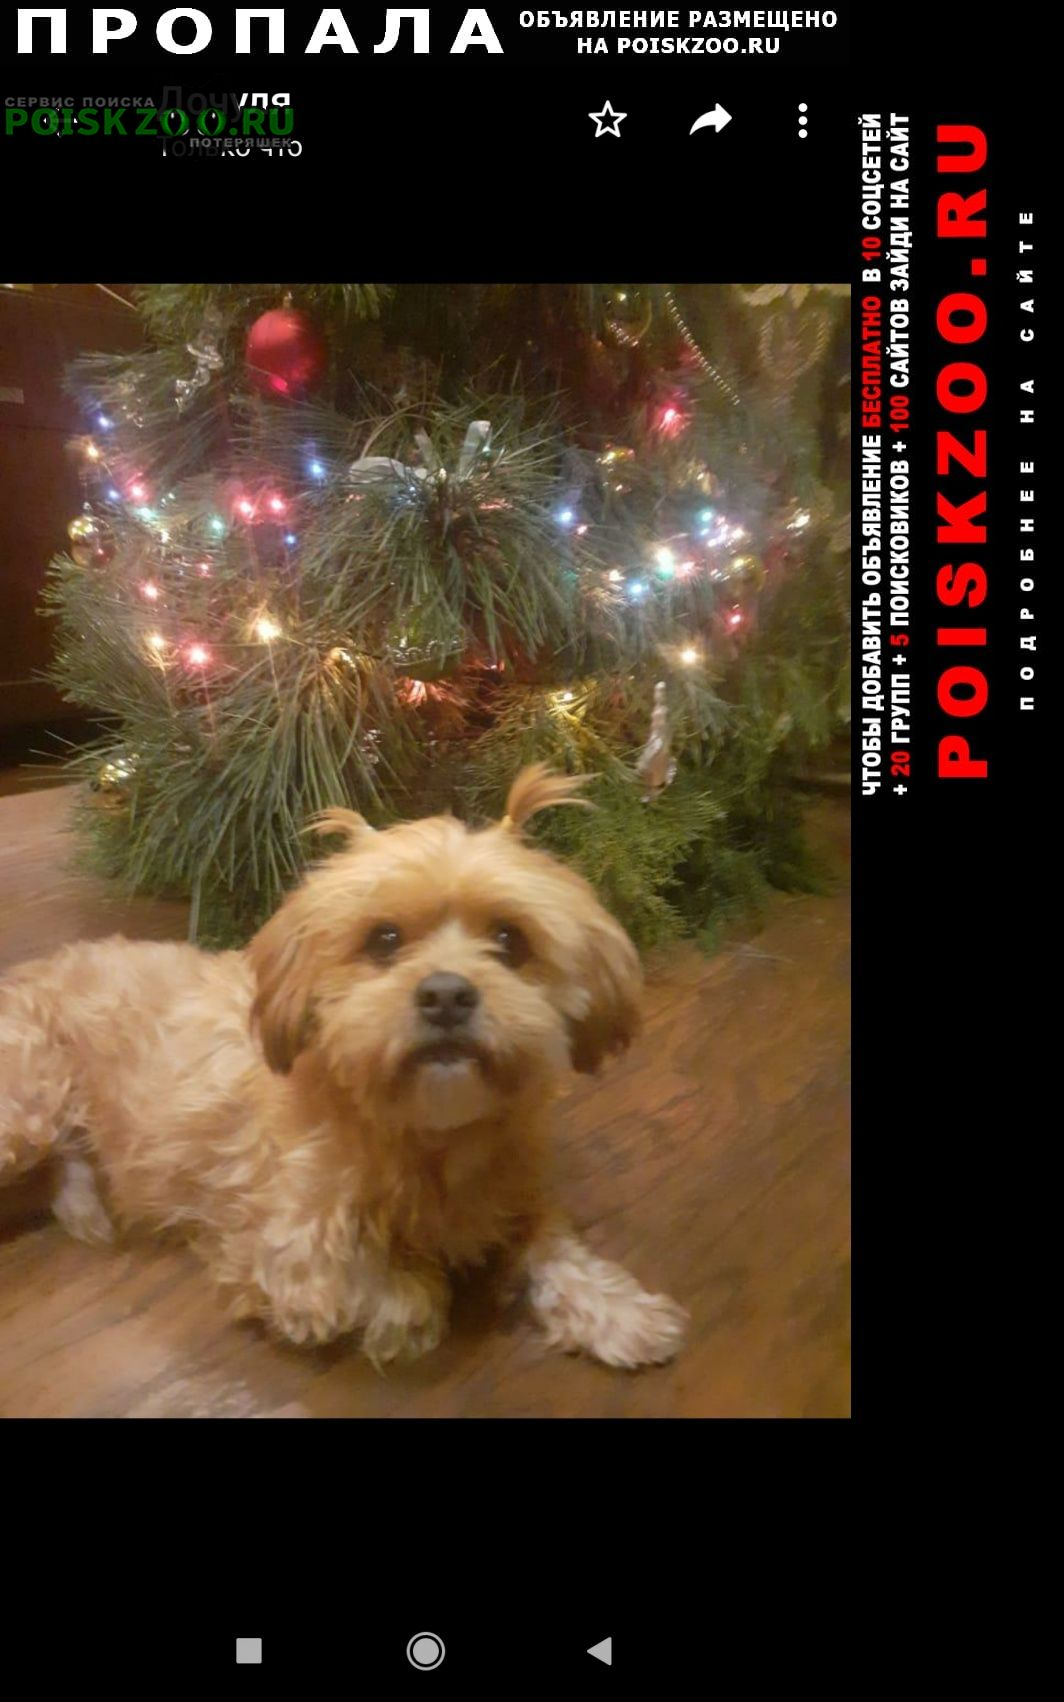 Пропала собака Шахты